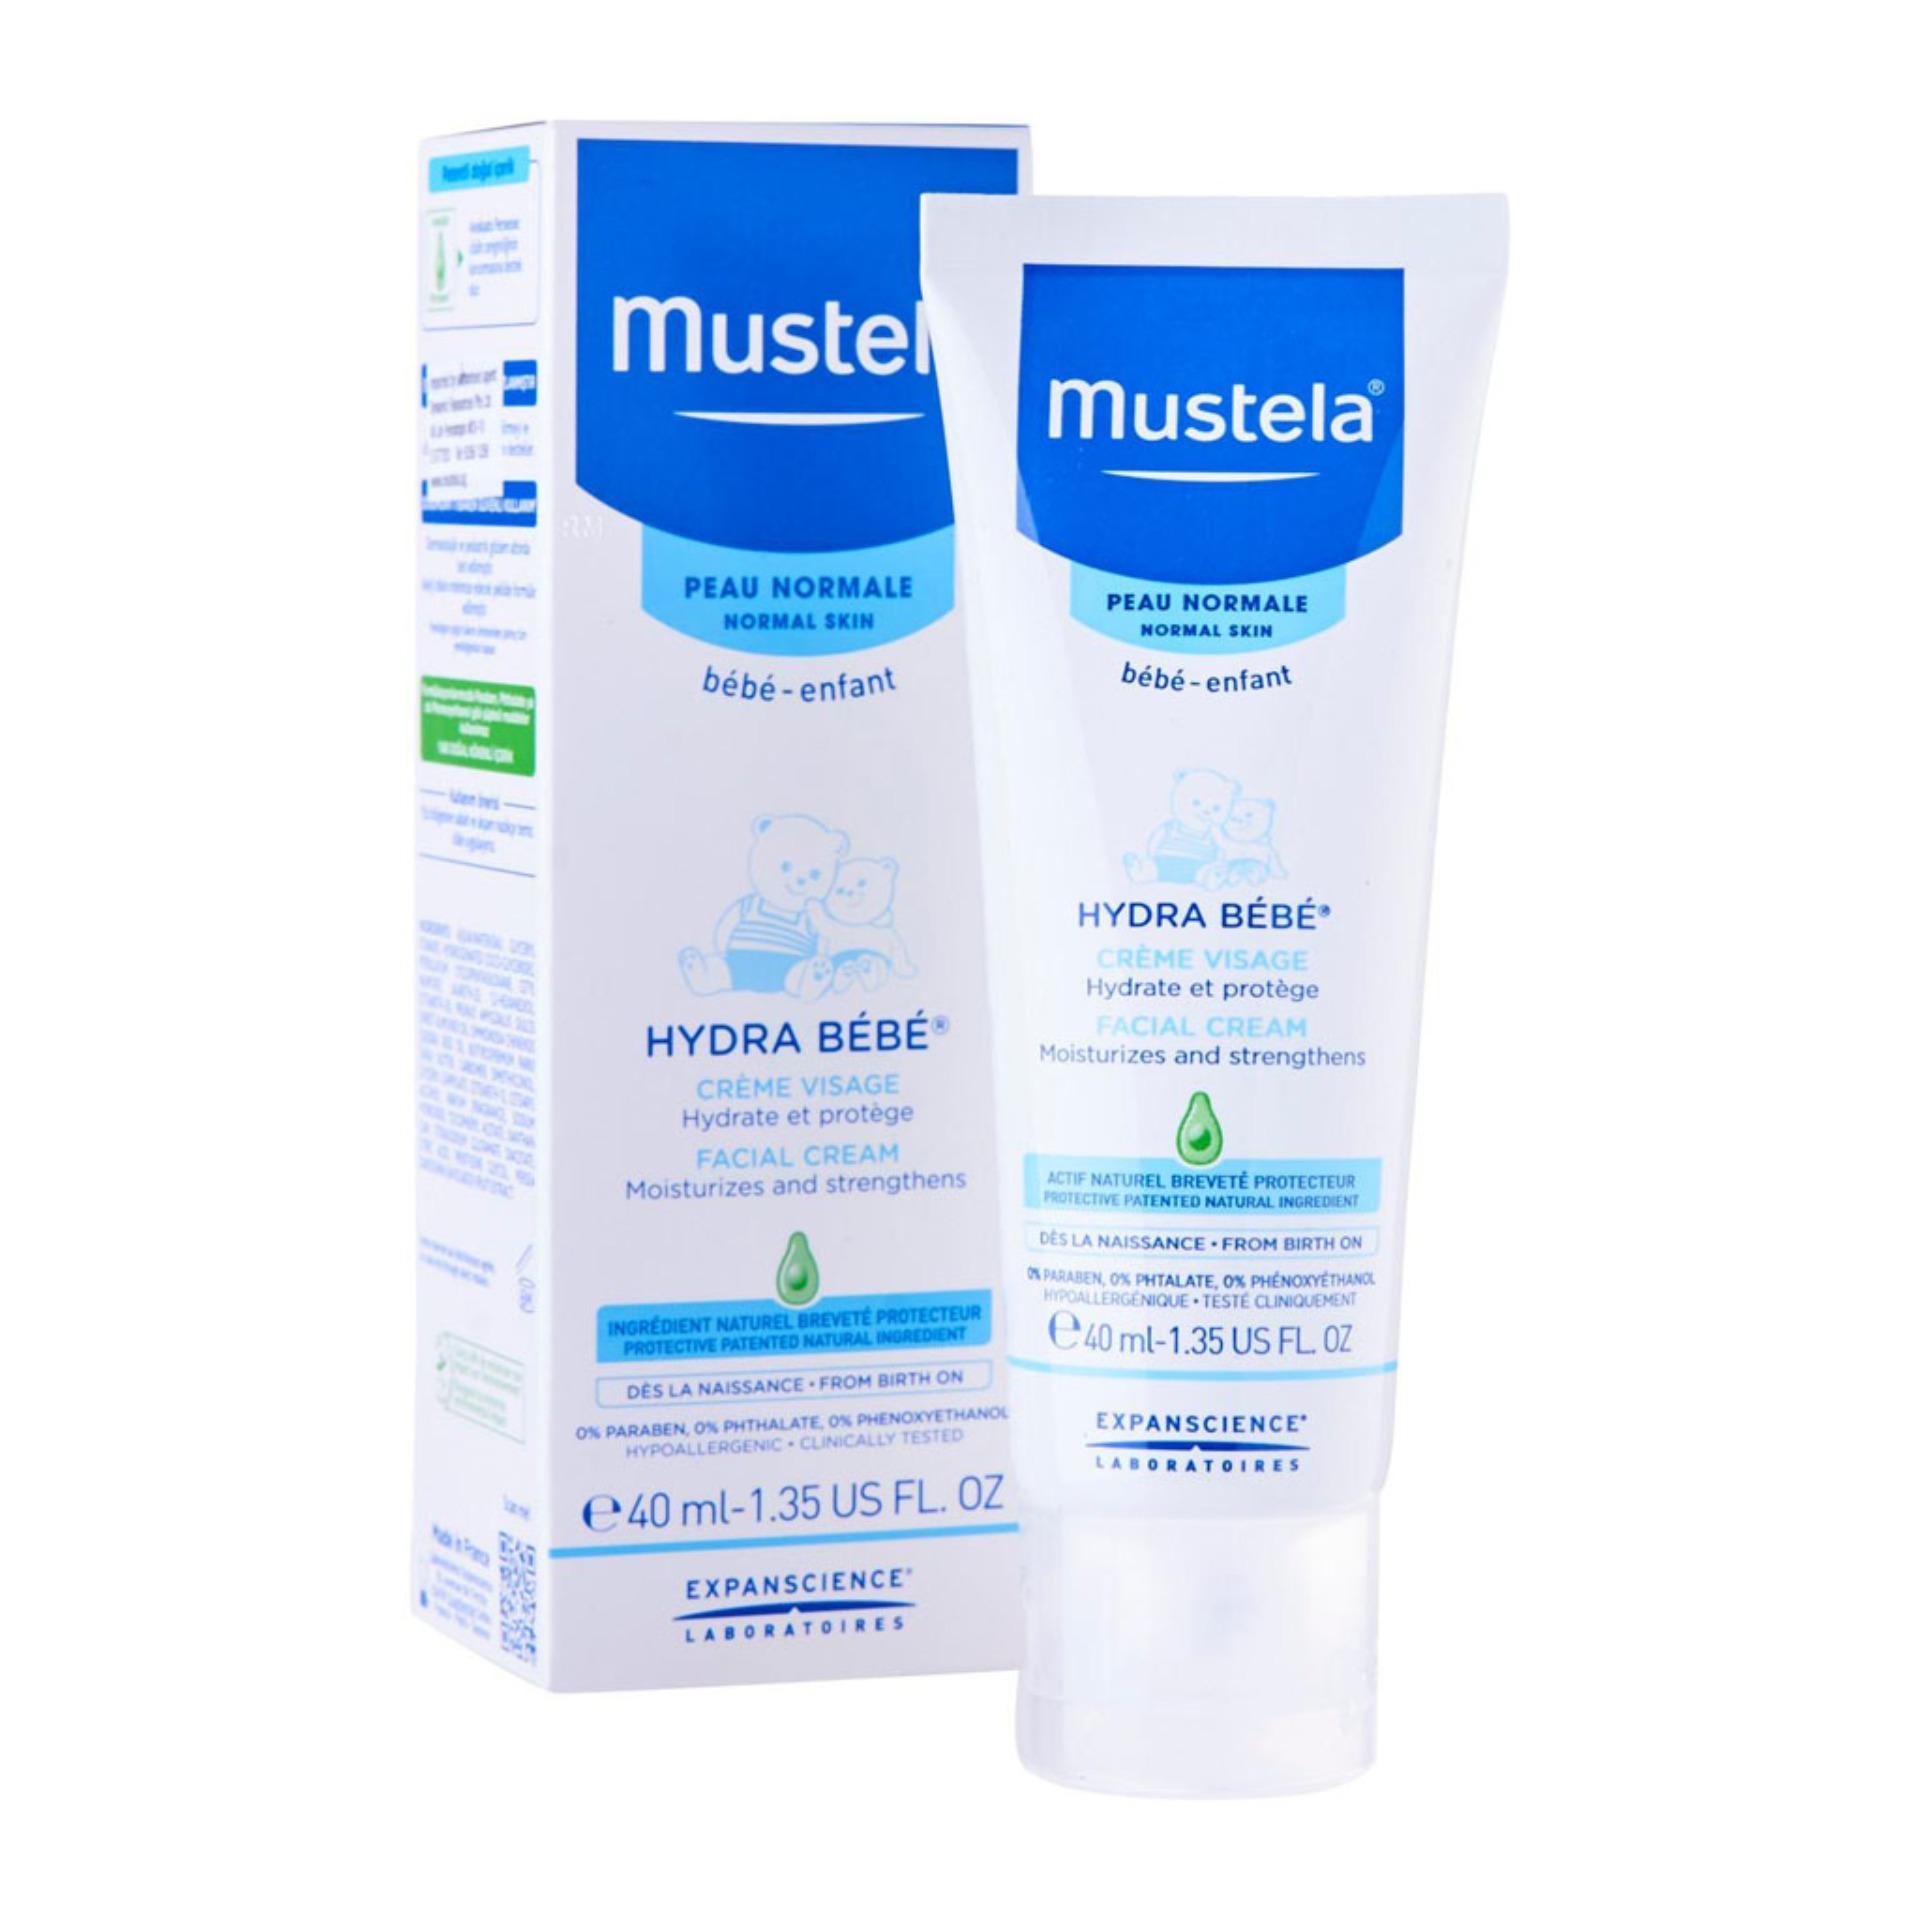 Retail Mustela Hydra Bebe F*C**L Cream 40Ml